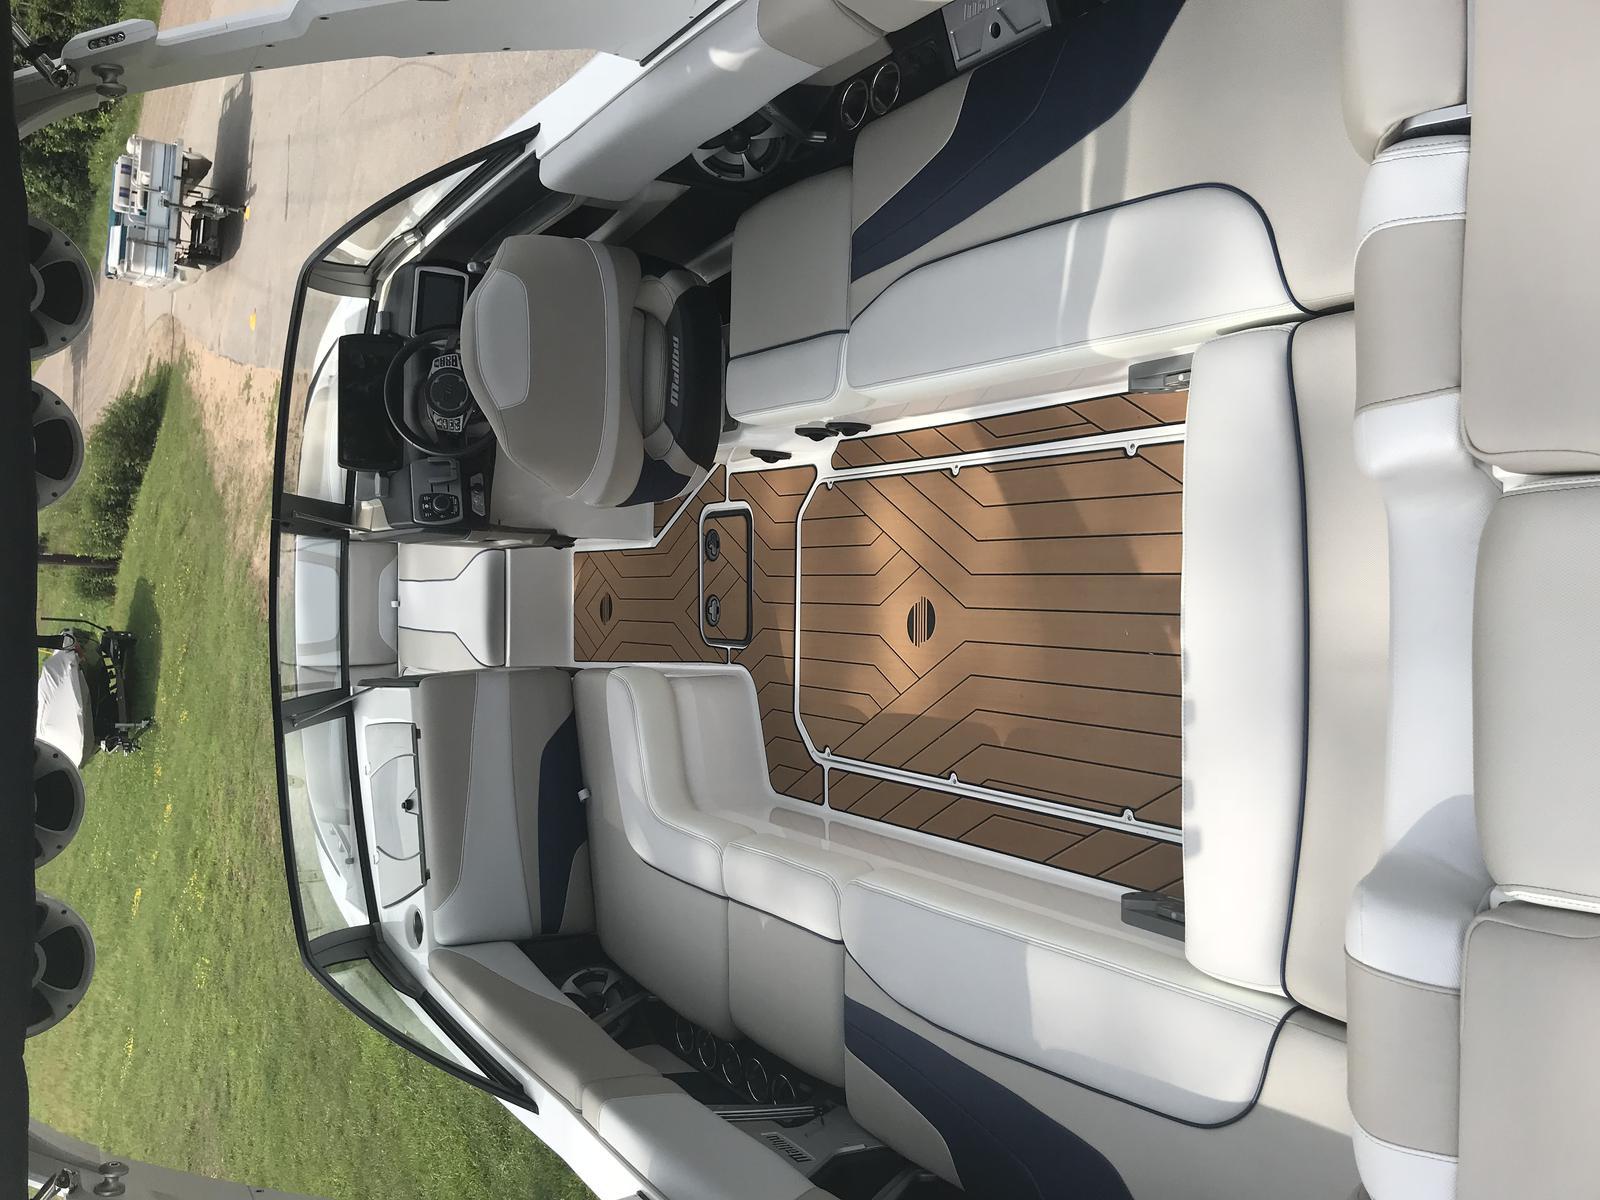 2018 Malibu Boats LLC Wakesetter 24 MXZ for sale in Minocqua